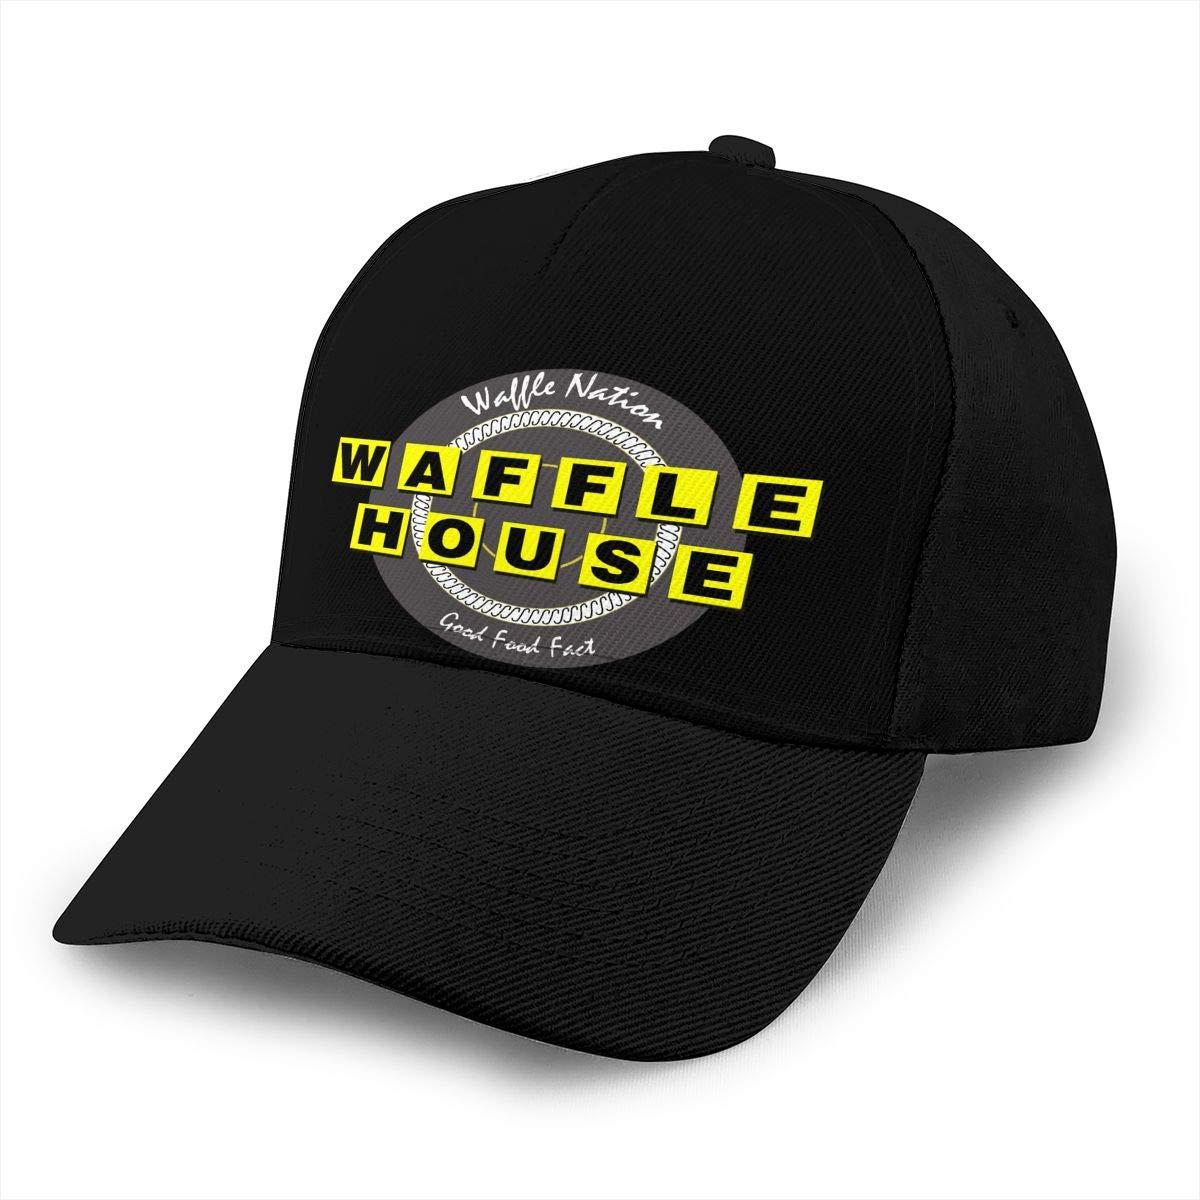 Adjustable Women Men Waffle-House Print Baseball Cap Flat Brim Cap Hats Hip Hop Snapback Sun Hat Boys Girls Black by Apolonia